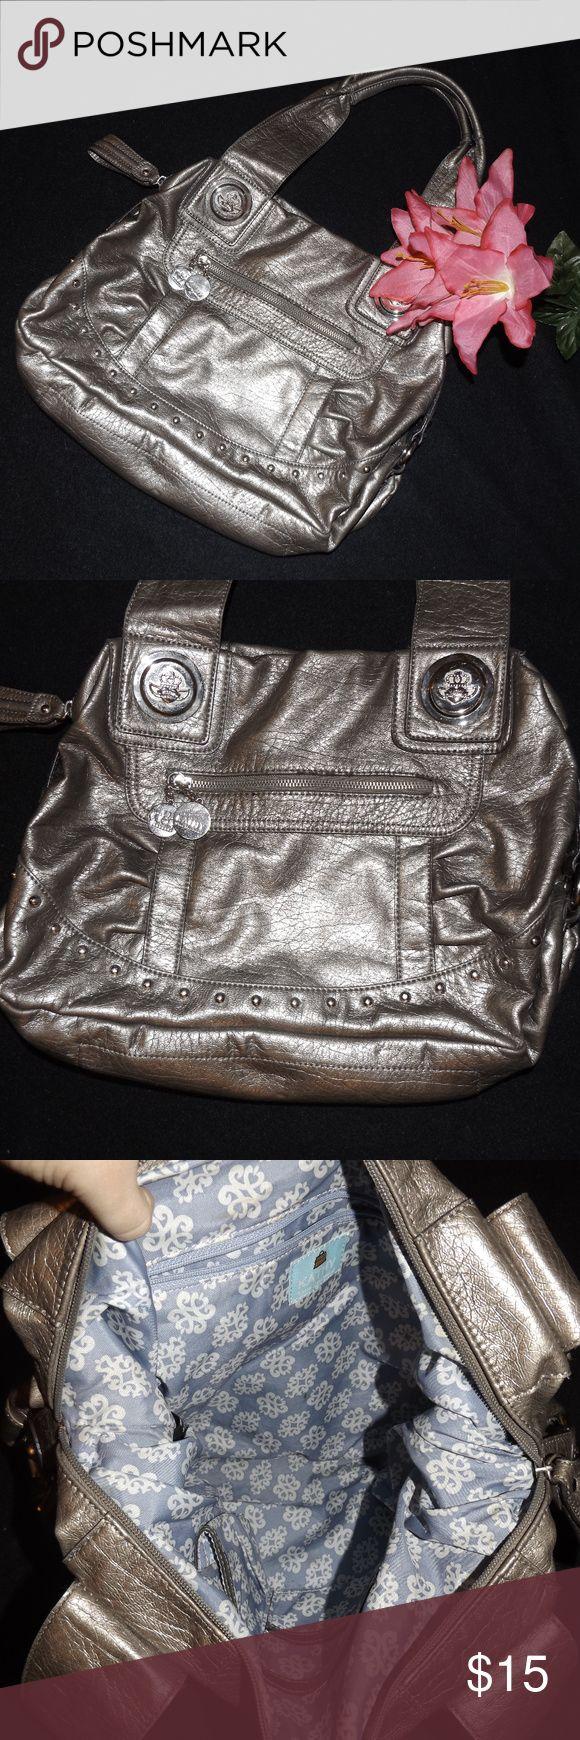 Kathy Van Zeeland Handbag Multiple Pockets, Really nice condition Kathy Van Zeeland Bags